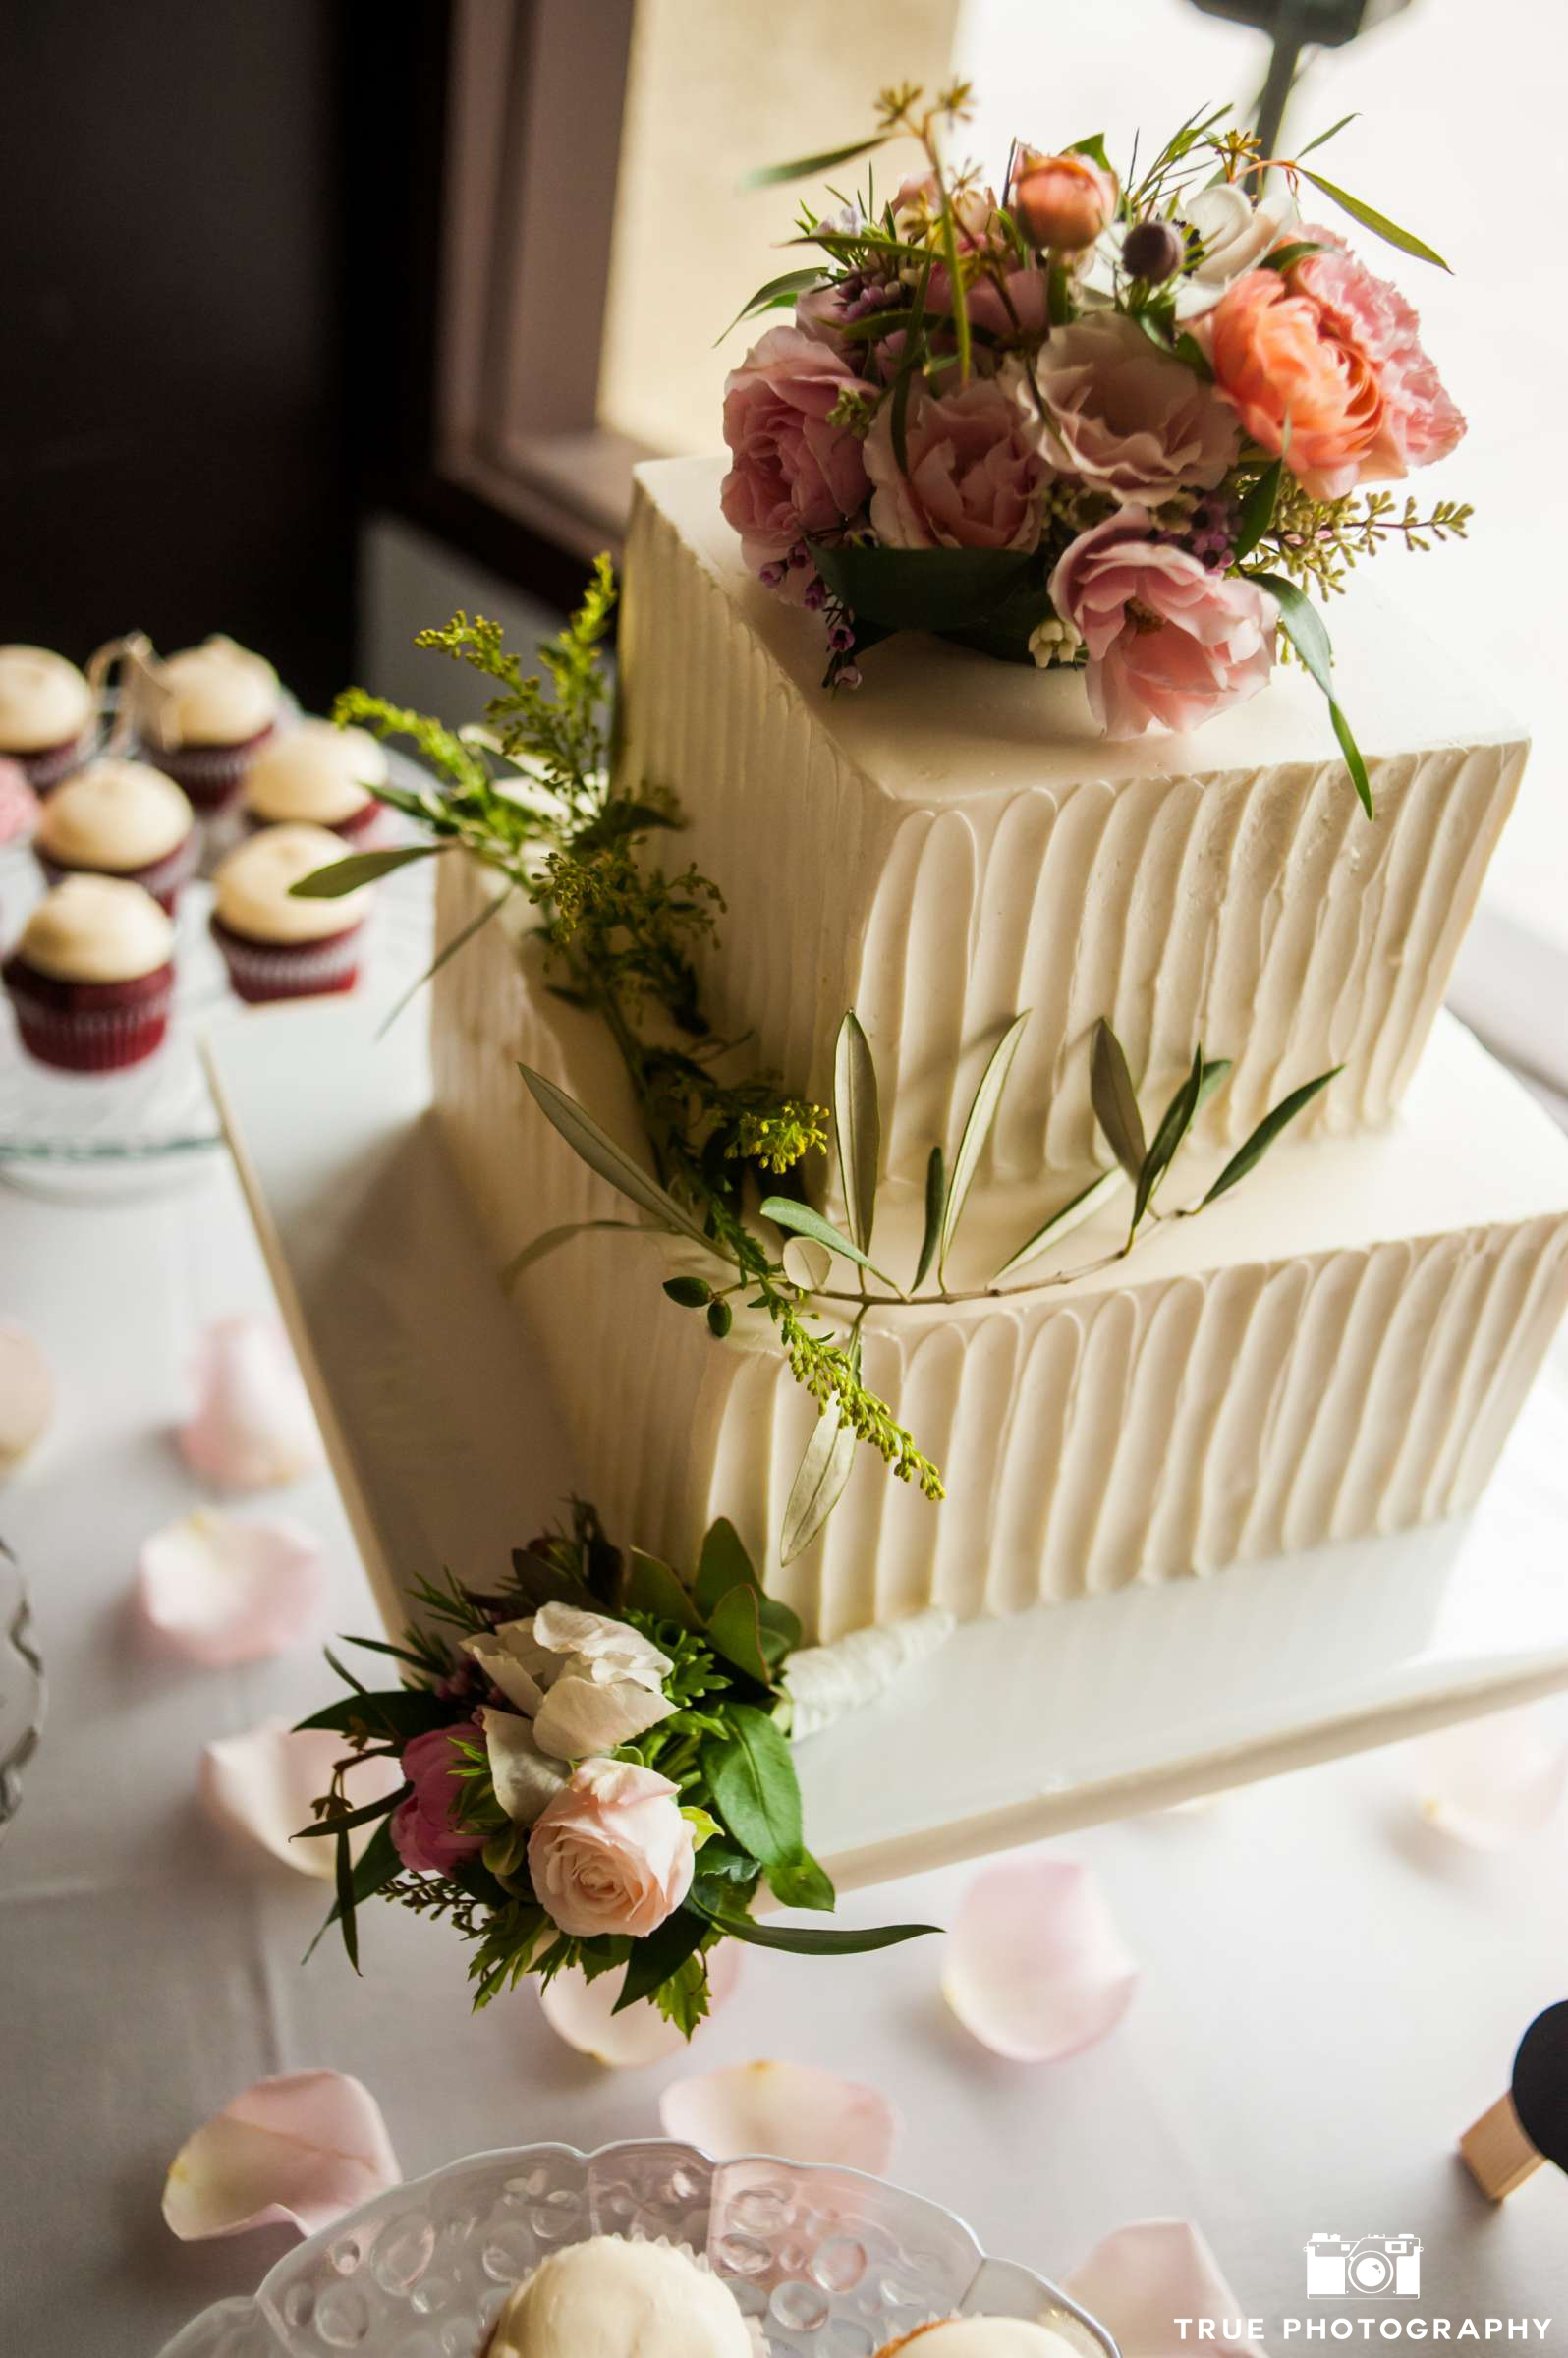 vertical-texture-squre-wedding-cake-by-sweet-cheeks-true-photo-for-natasha_qaes_pf